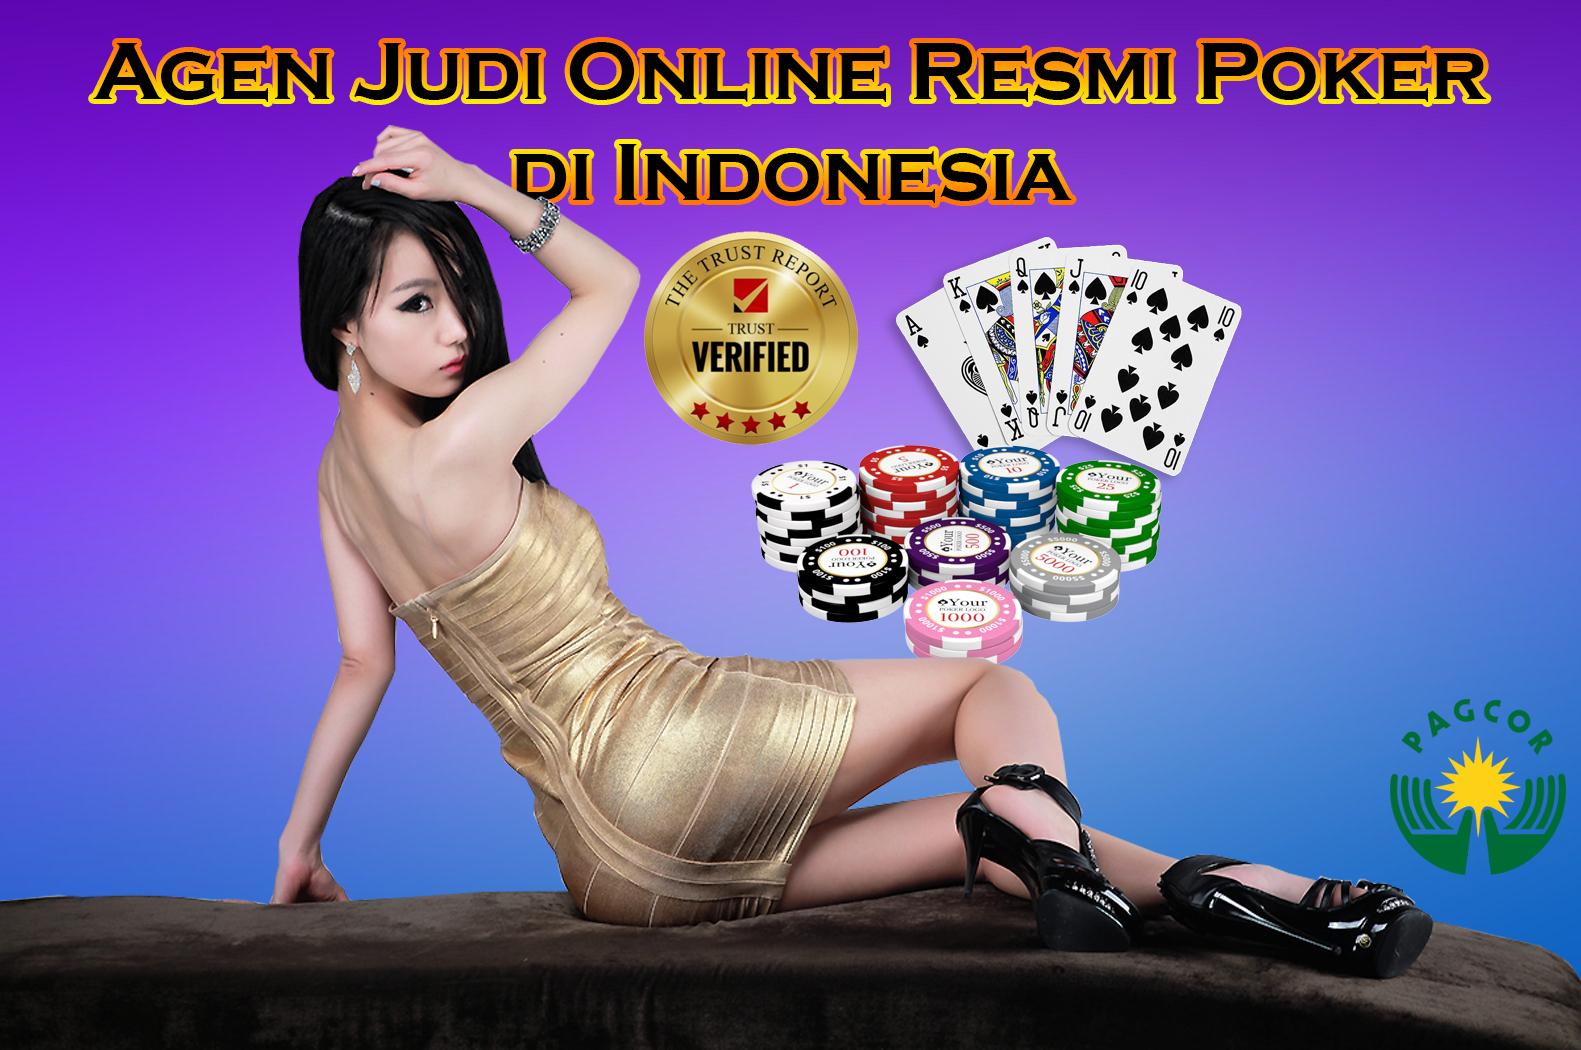 Agen Judi Online Resmi Poker di Indonesia